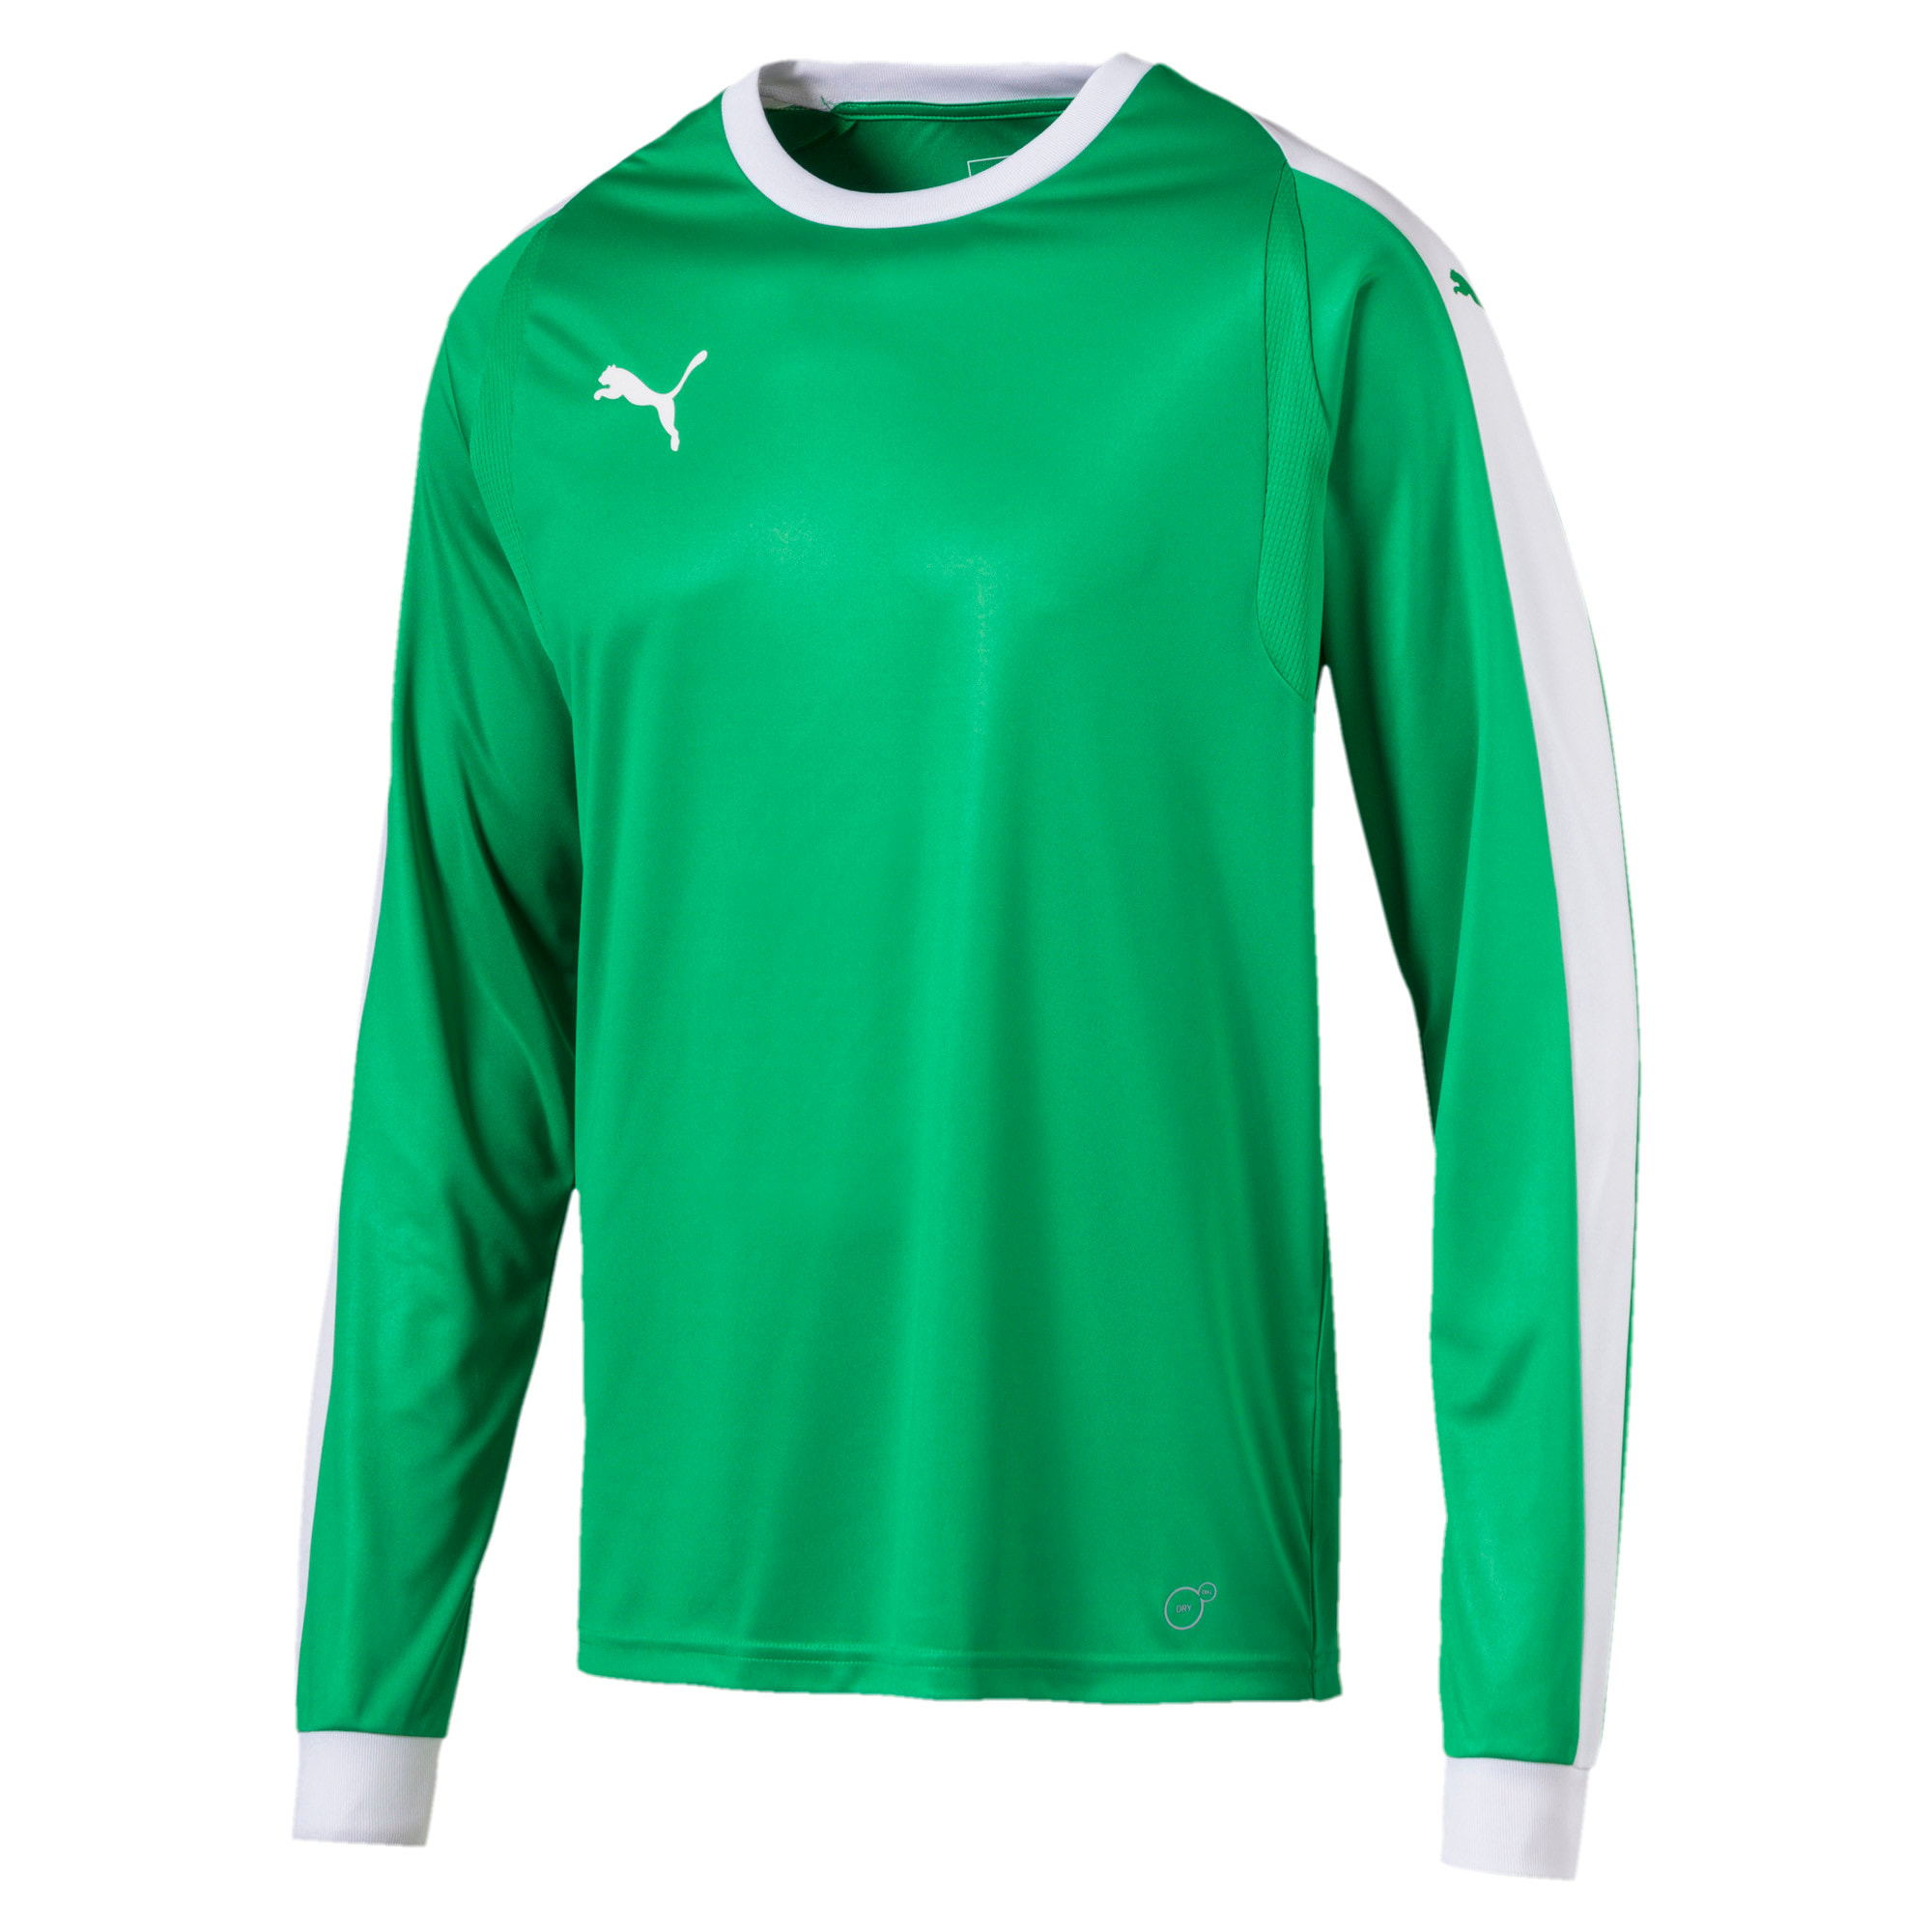 Thumbnail 1 of LIGA Long Sleeve Men's Football Goalkeeper Jersey, Bright Green-Puma White, medium